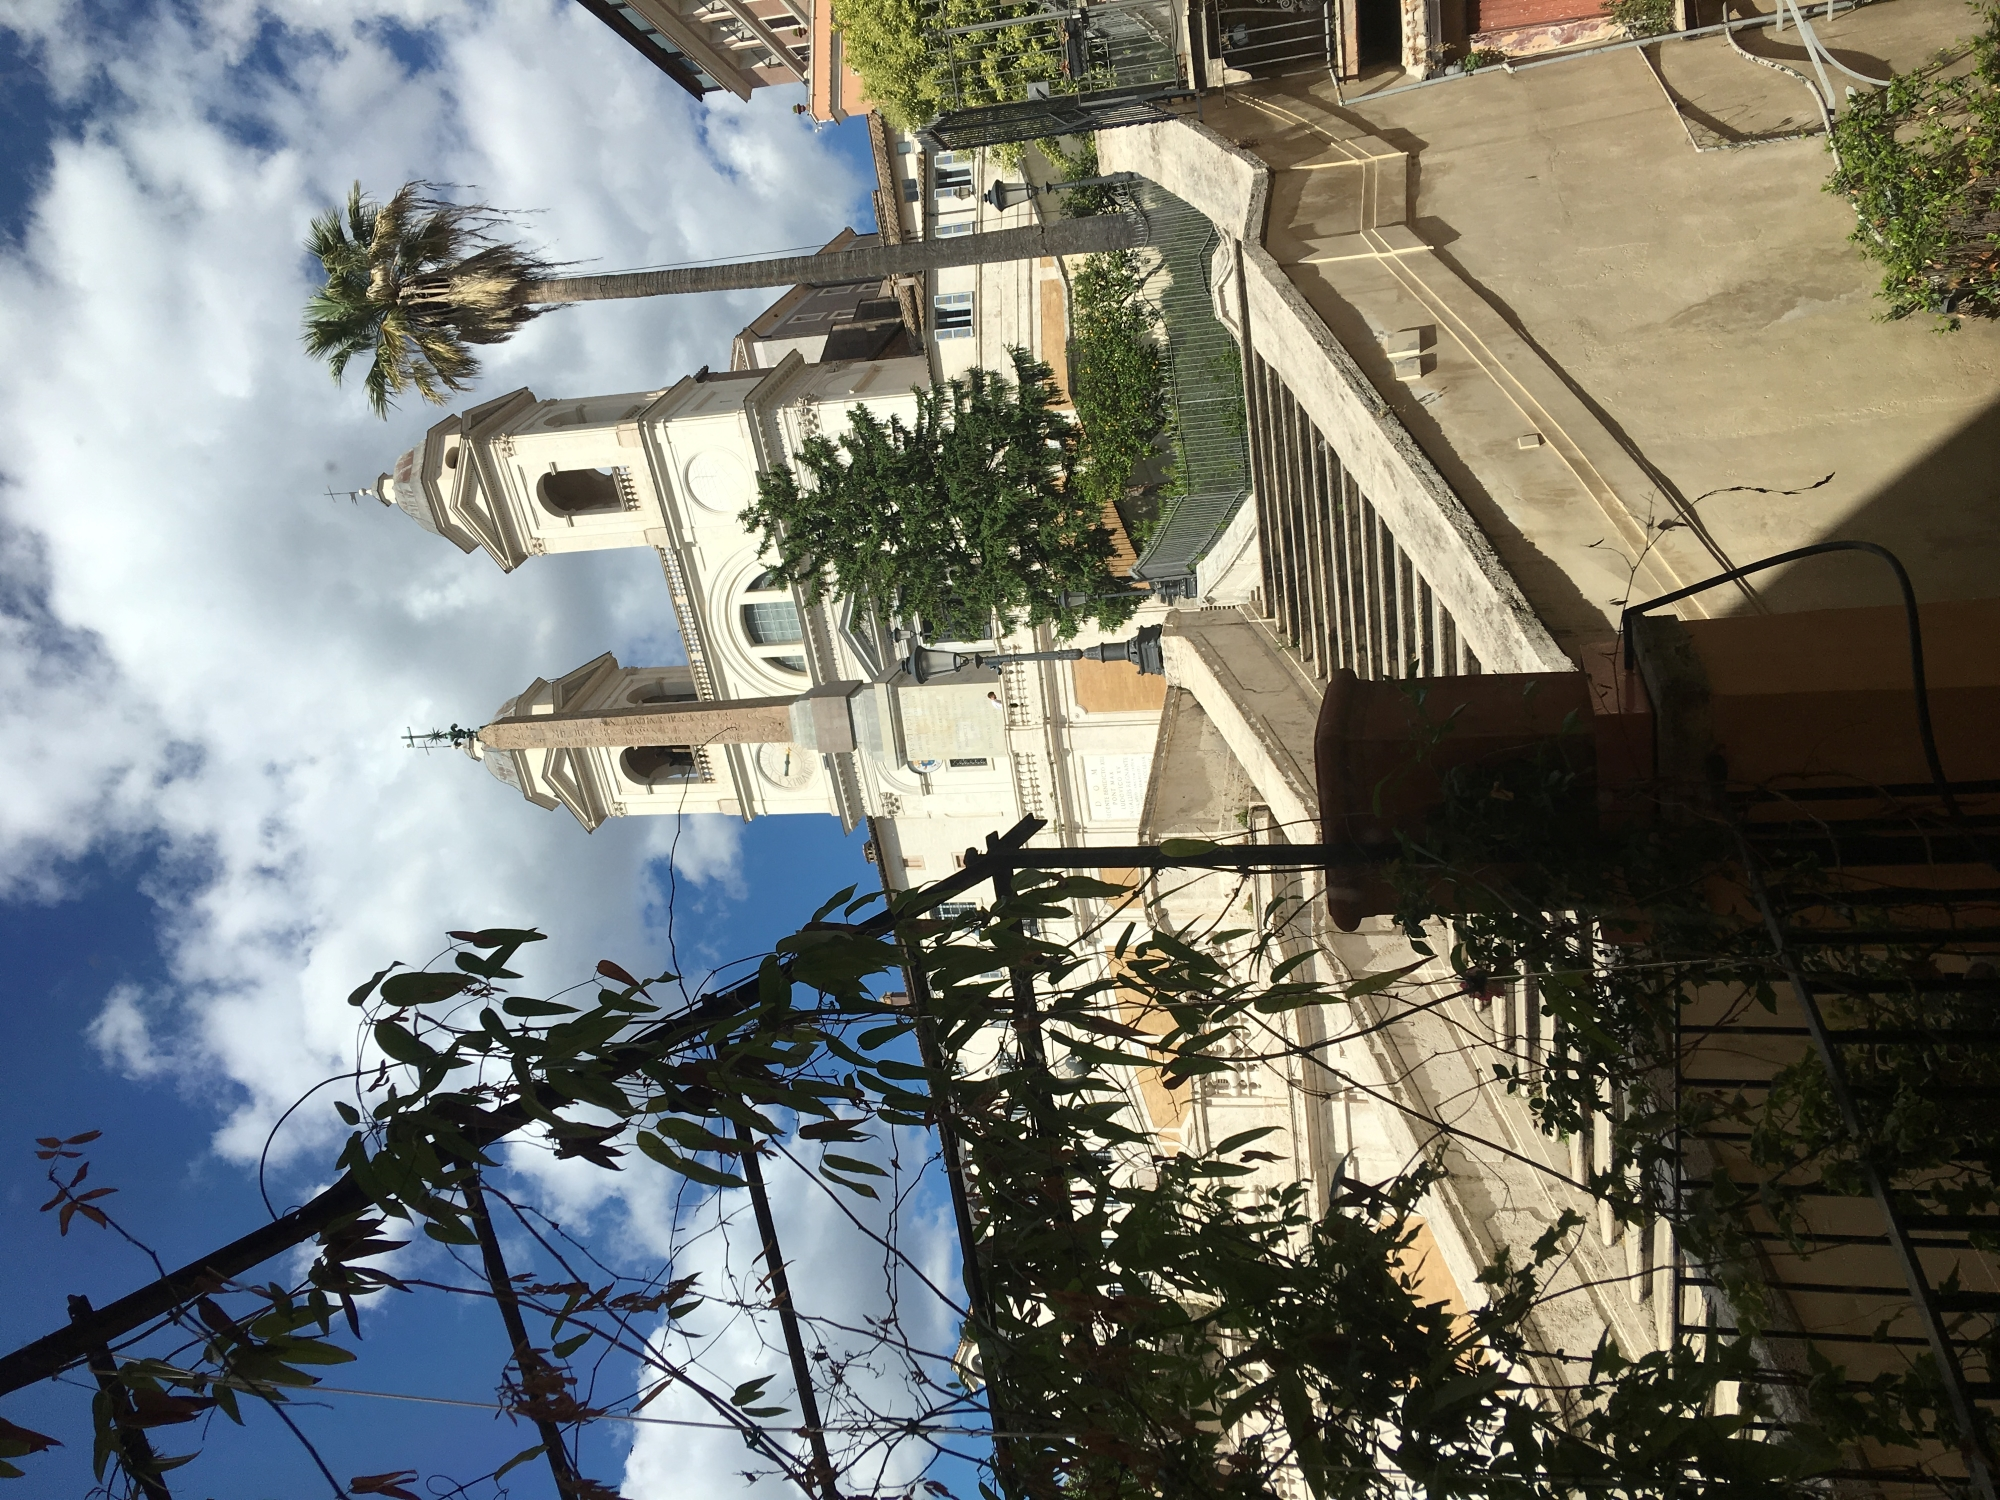 rocaille-blog-keats-shelley-casa-museo-roma